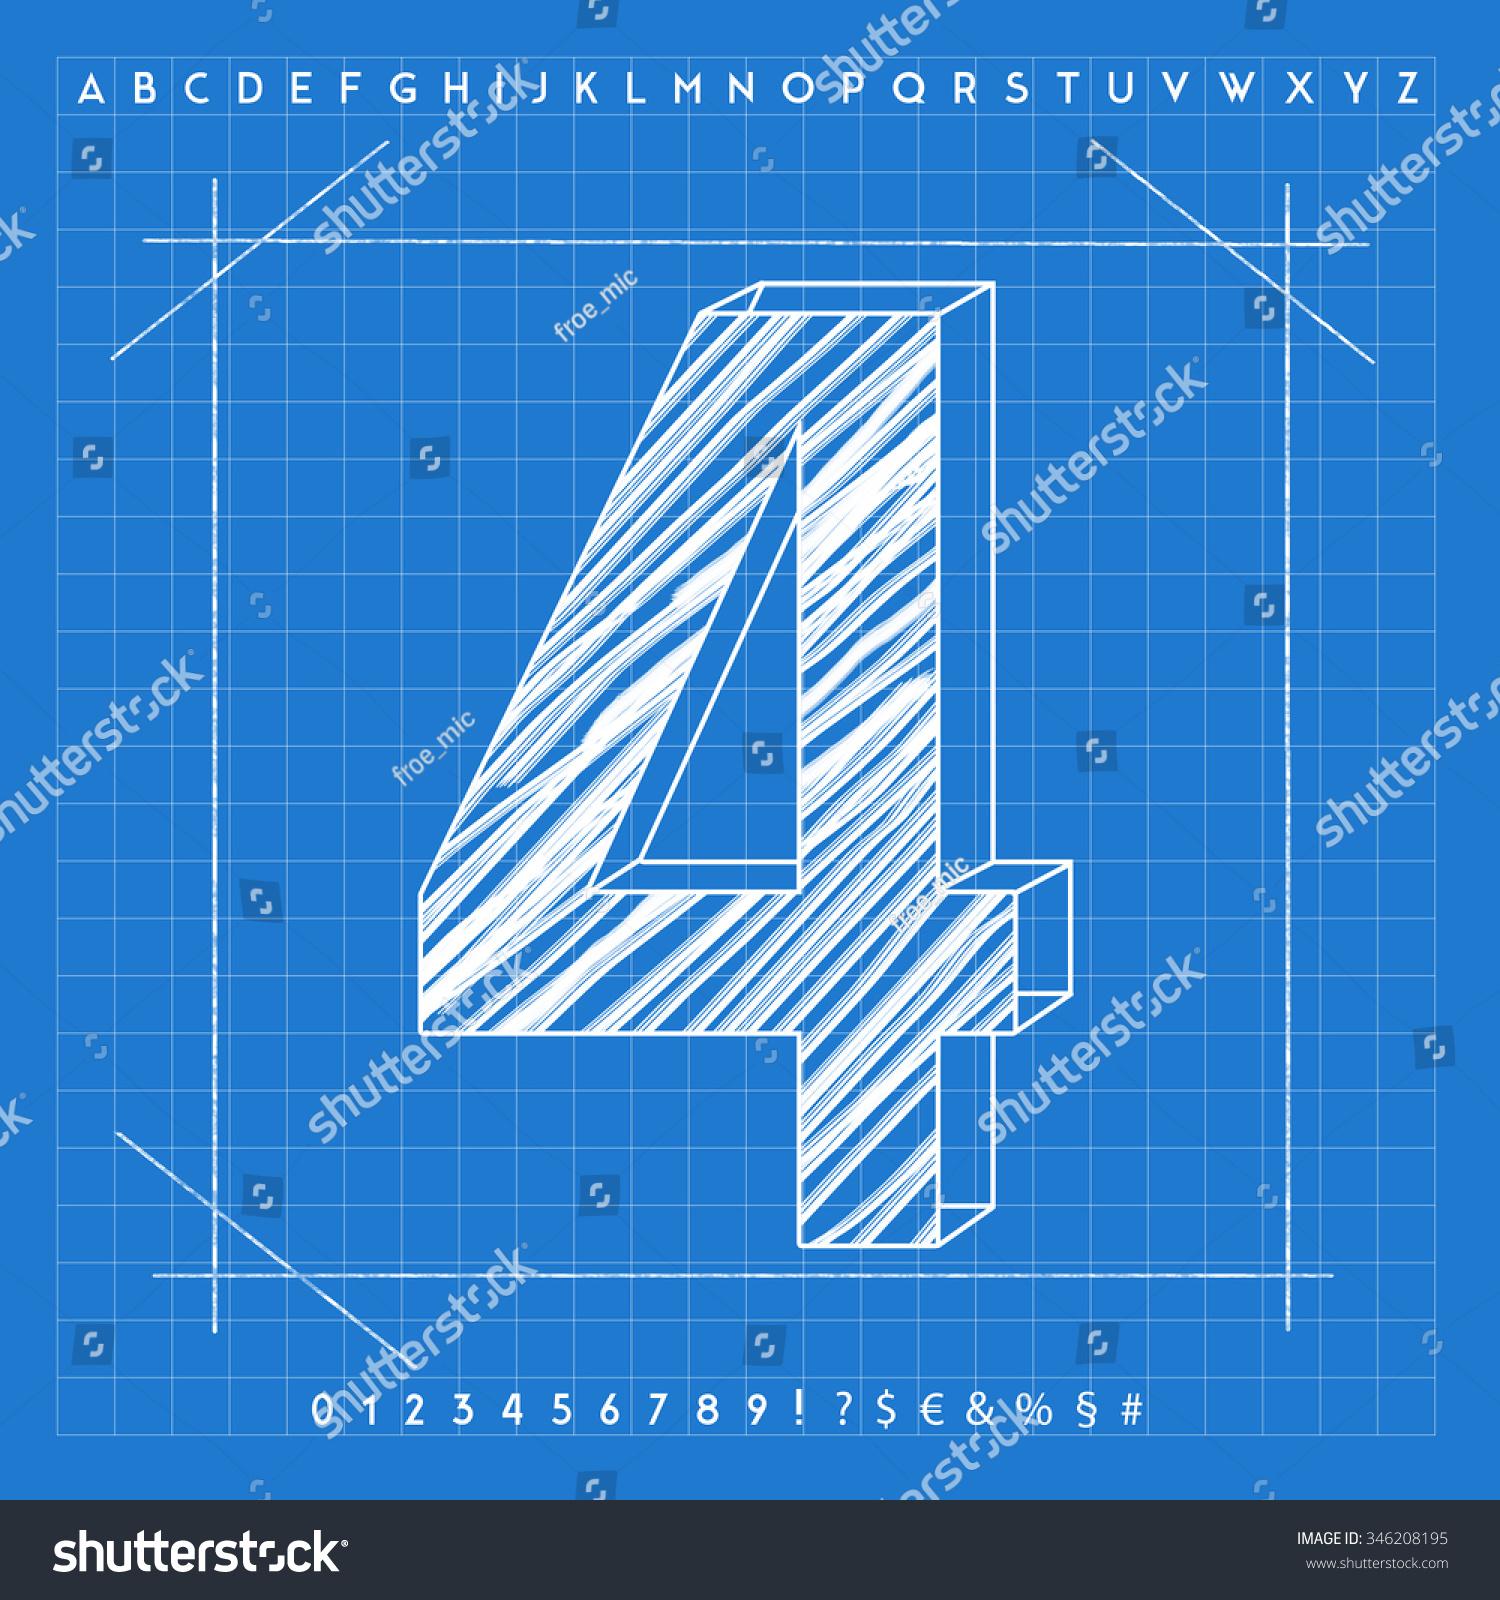 Blueprint number geccetackletarts blueprint number malvernweather Gallery